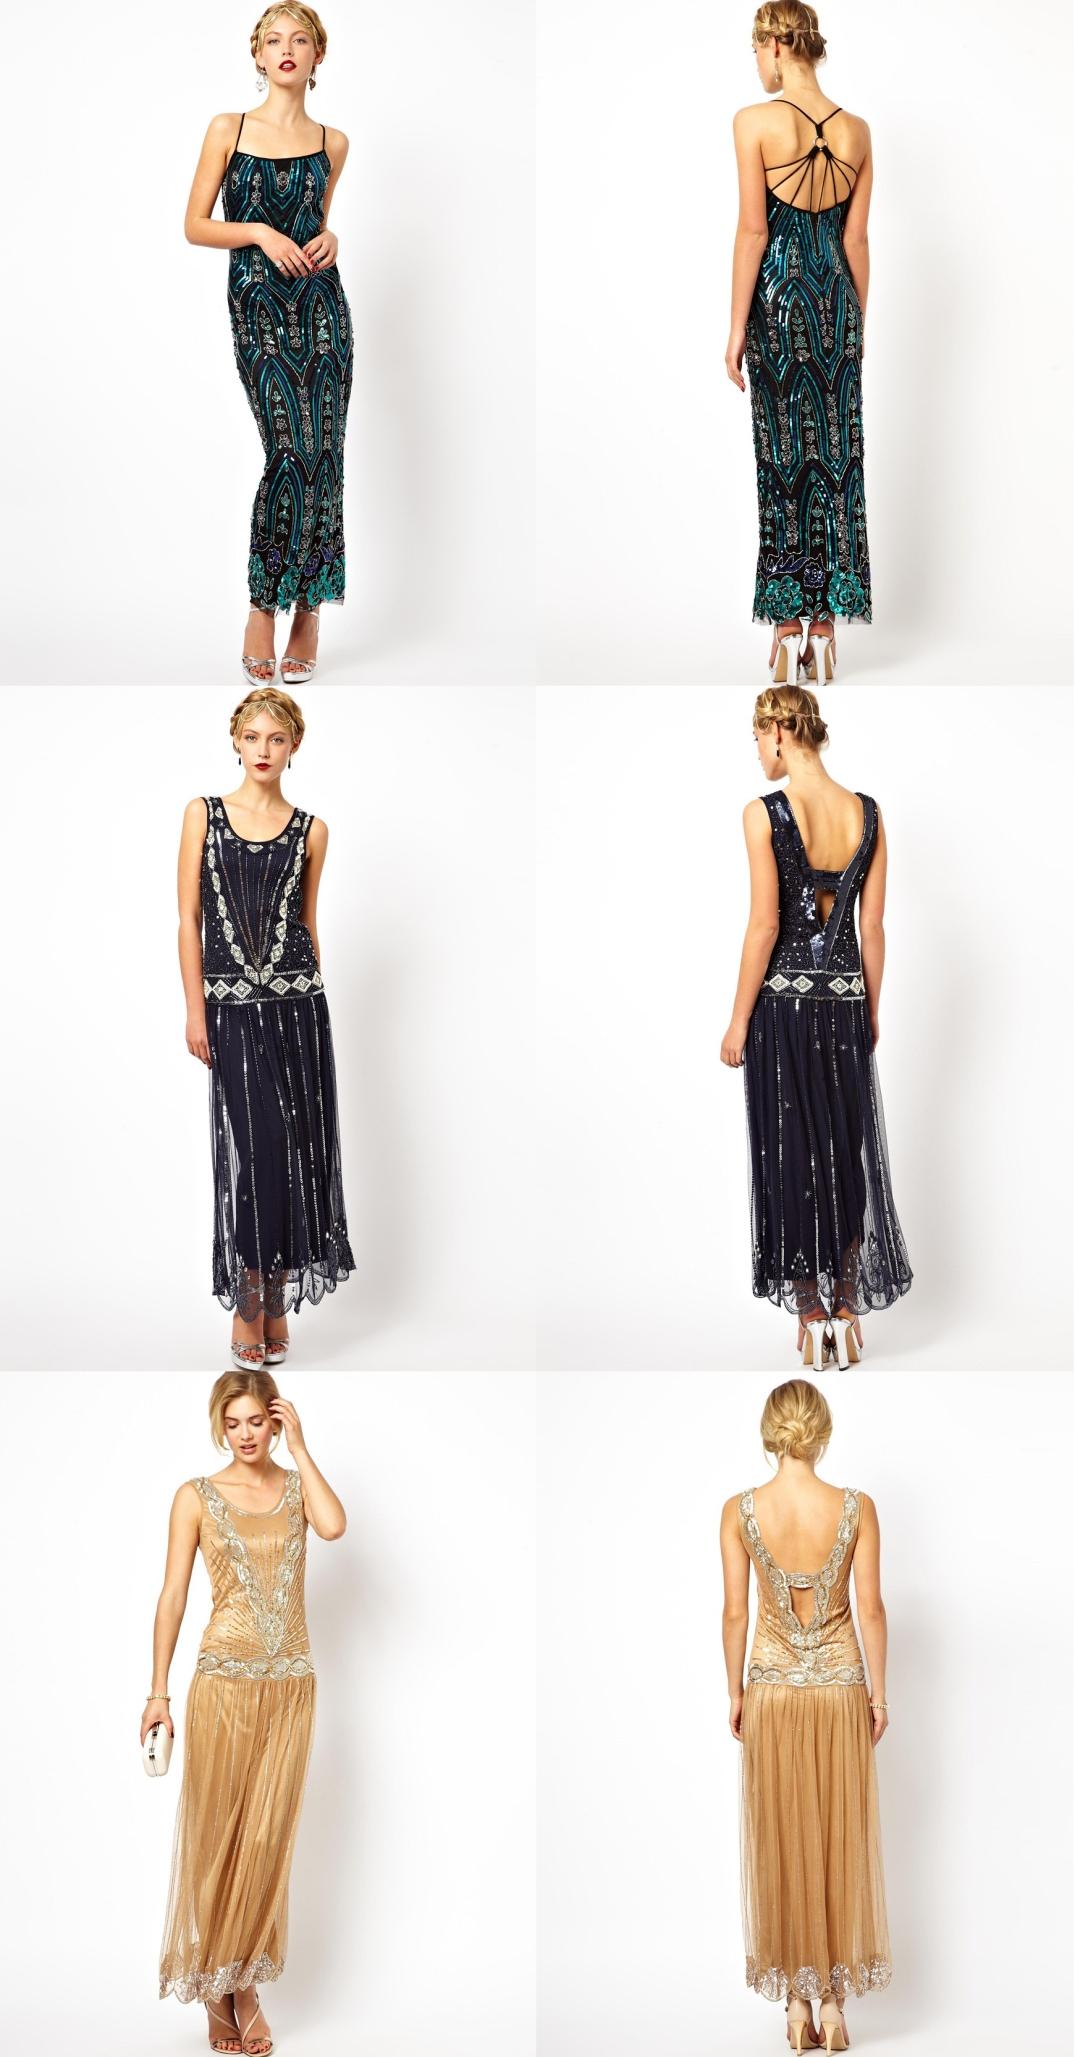 Vestidos largos de Frock and Frill. (www.frockandfrill.com)